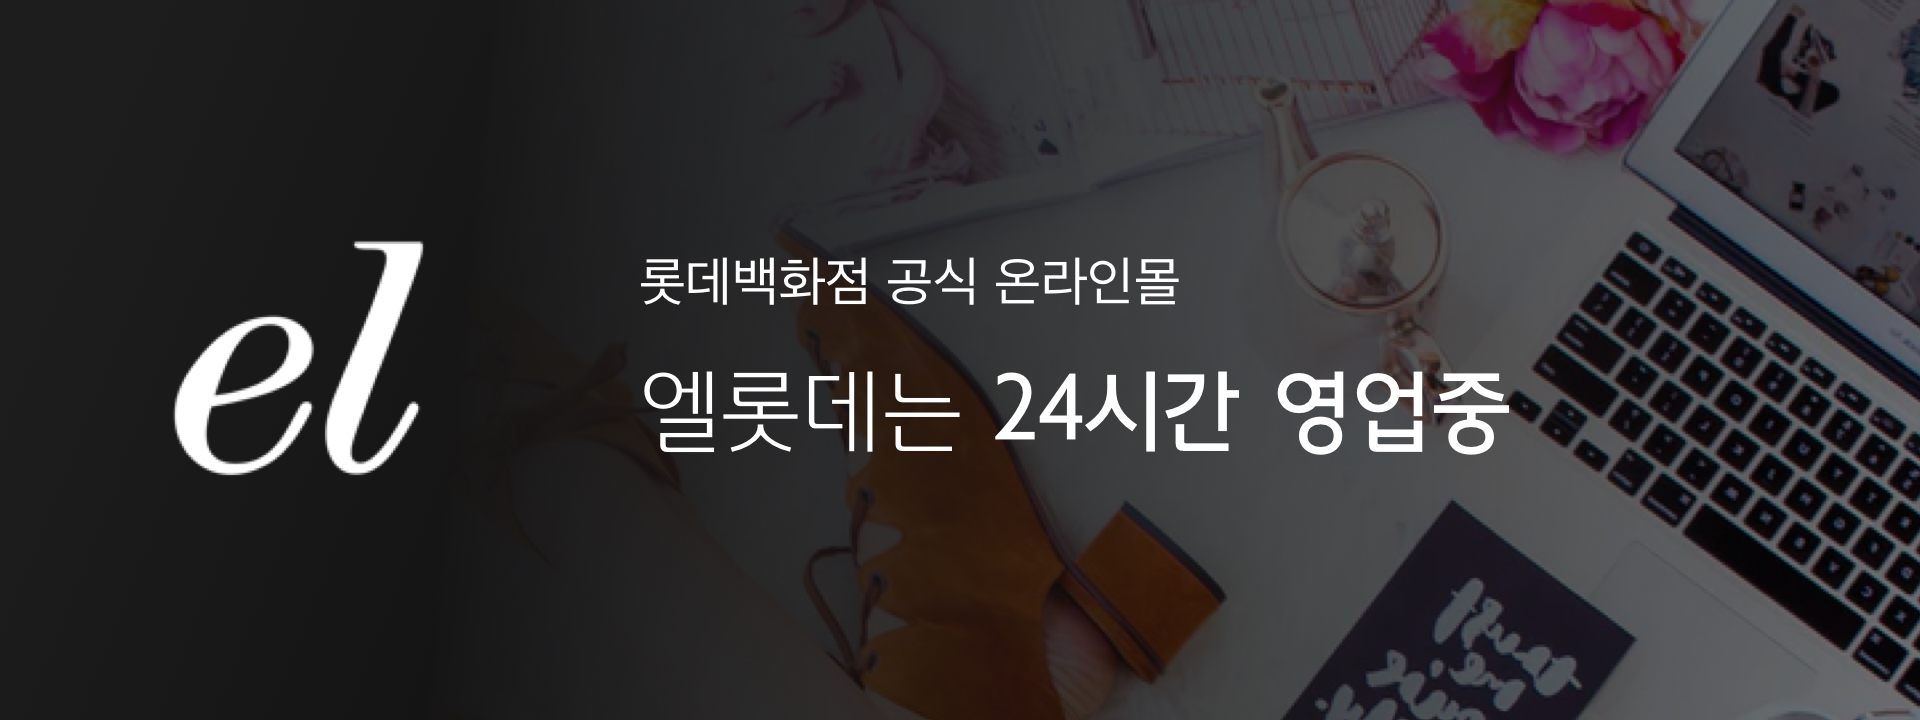 ellotte 롯데백화점 공식 온라인몰